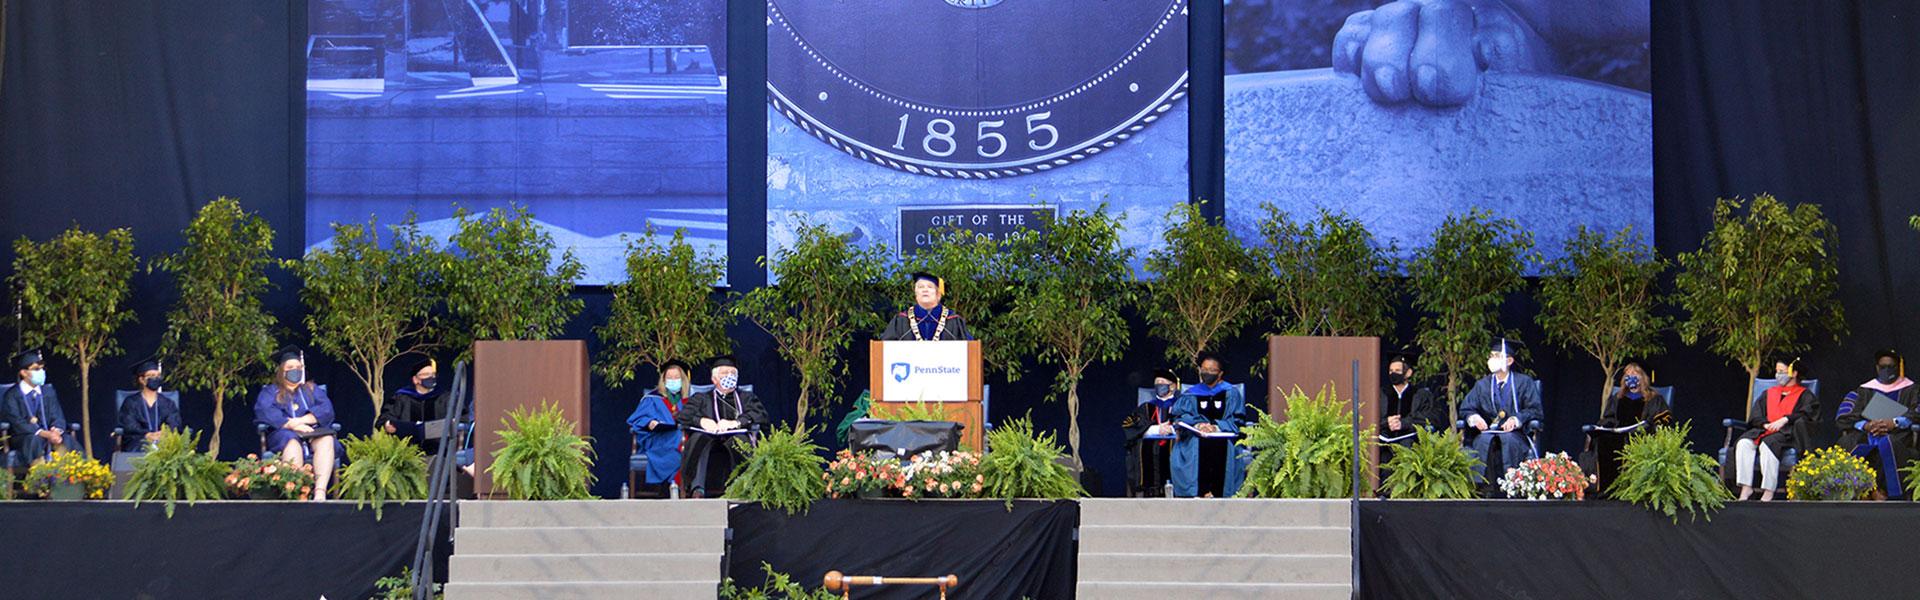 Graduation at Beaver Stadium 2021